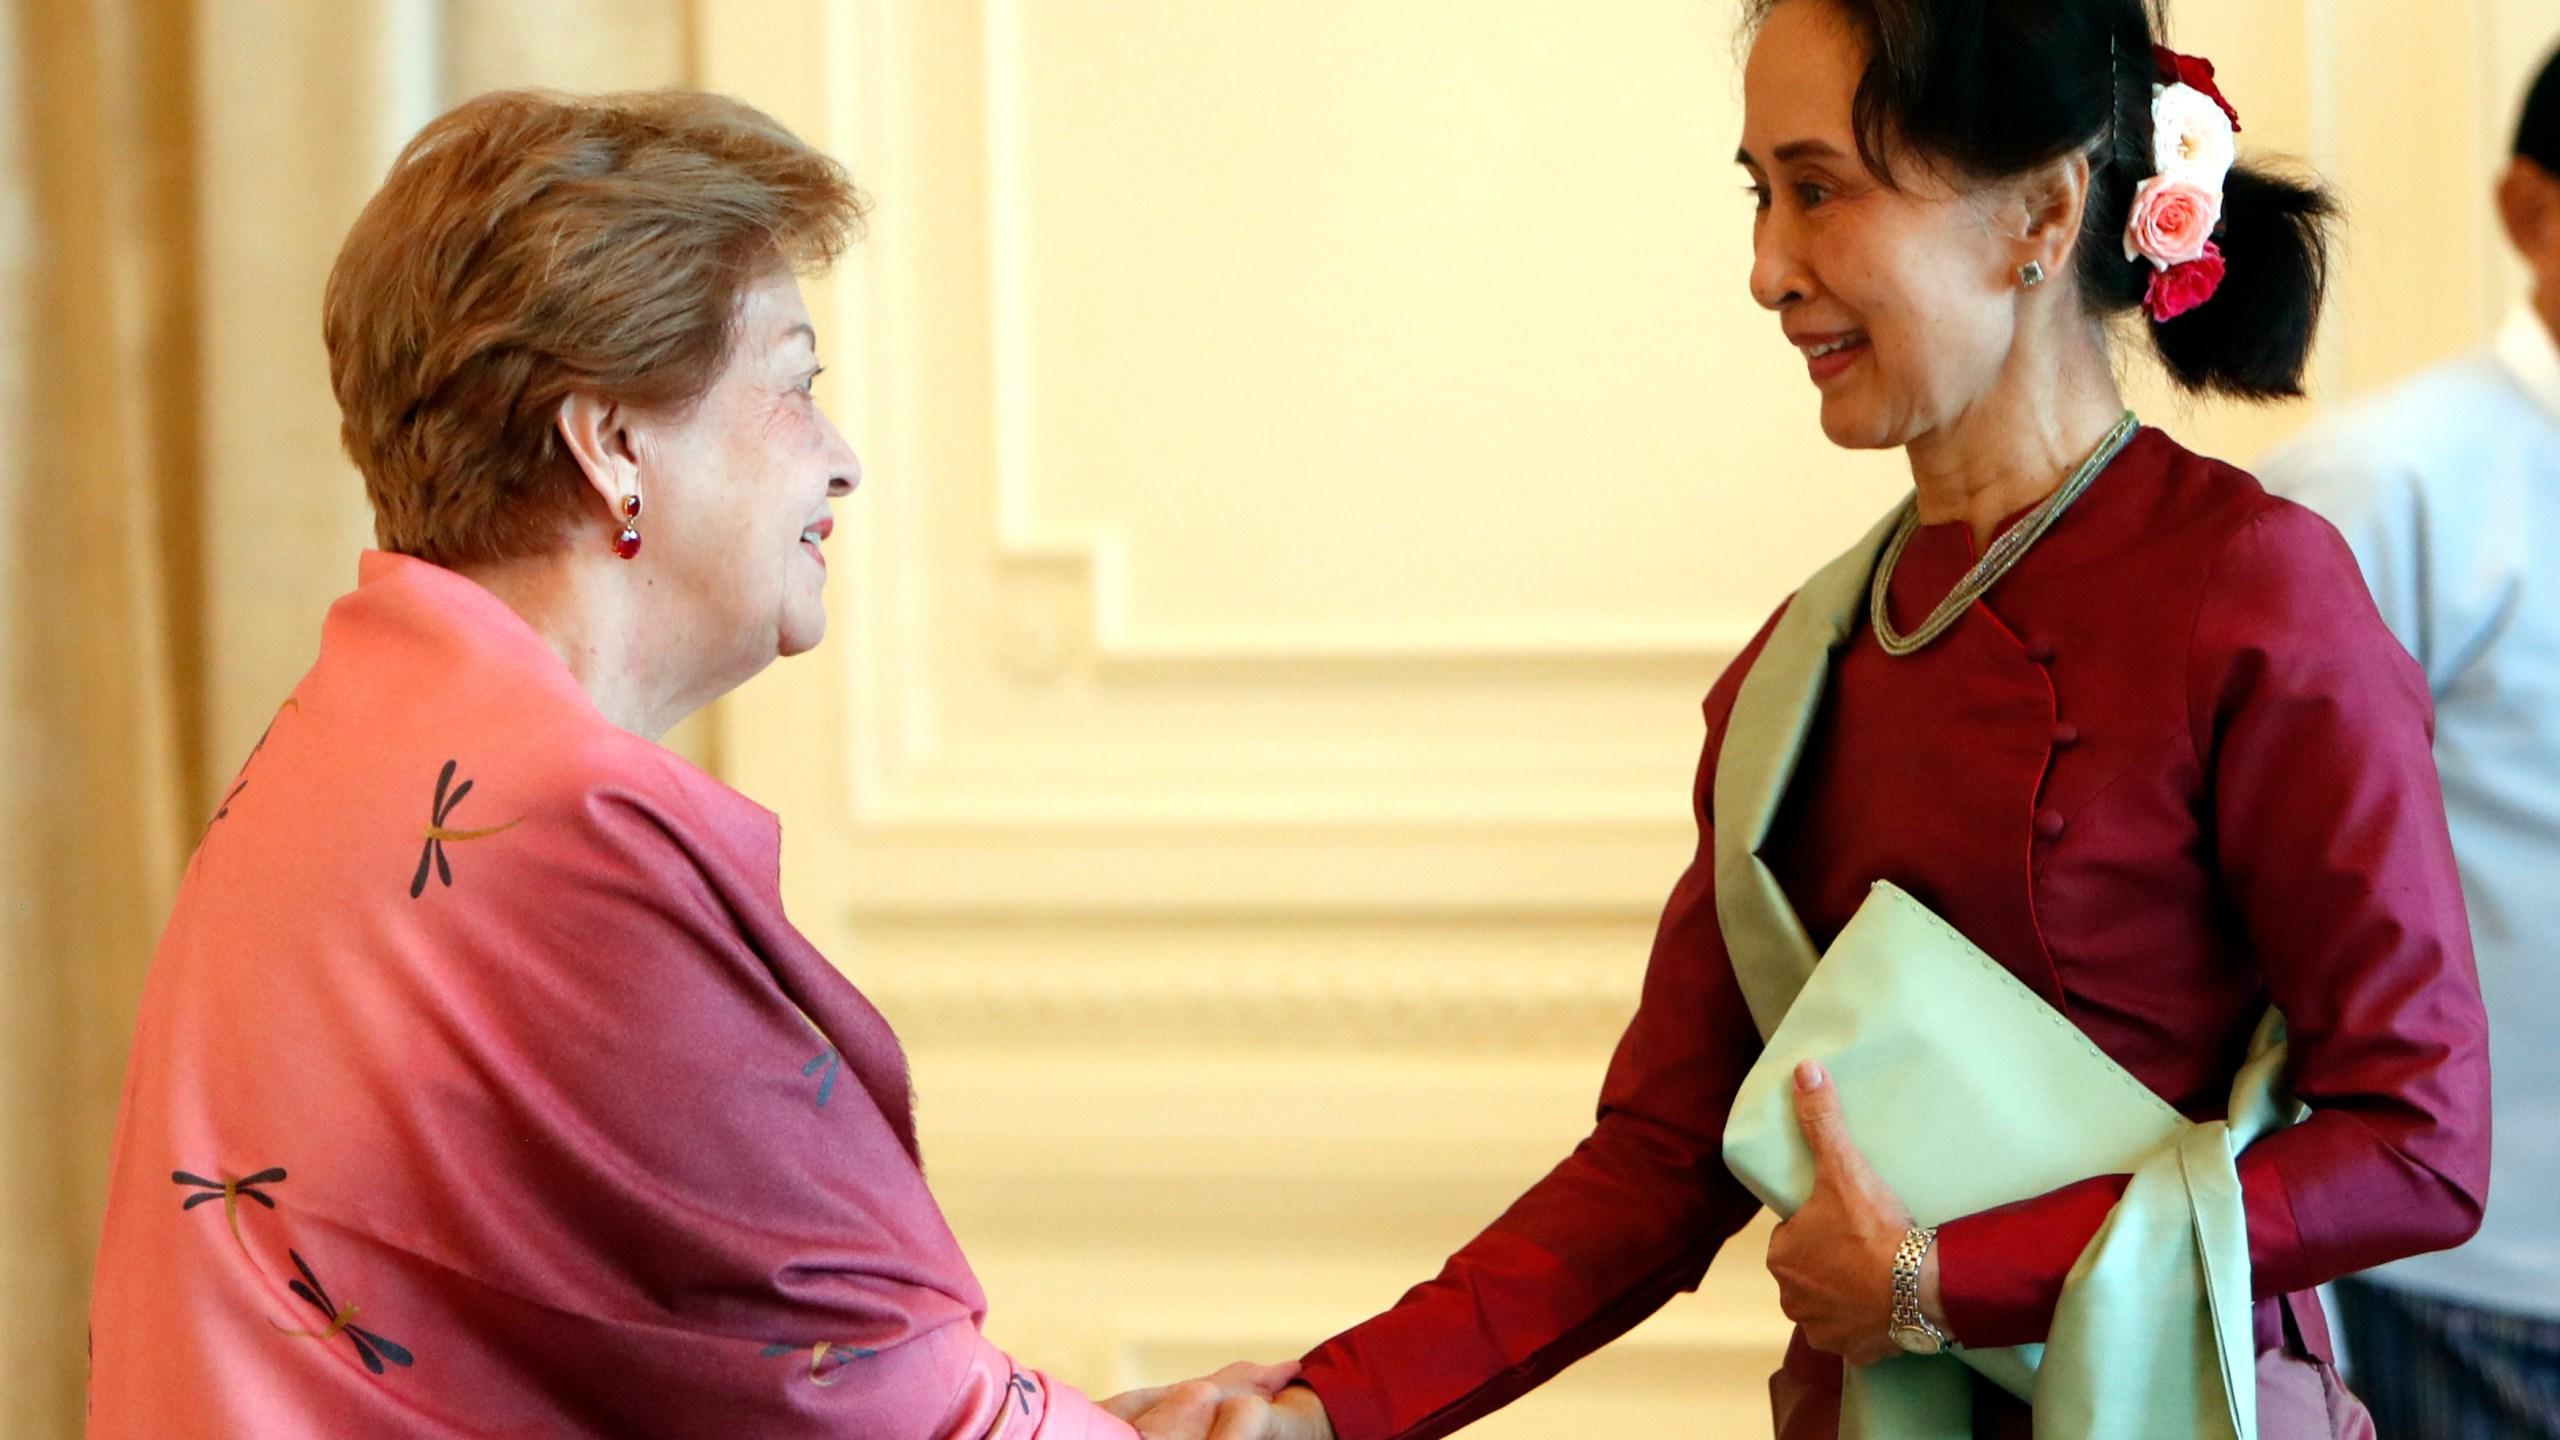 Aung San Suu Kyi, Rosario Manalo